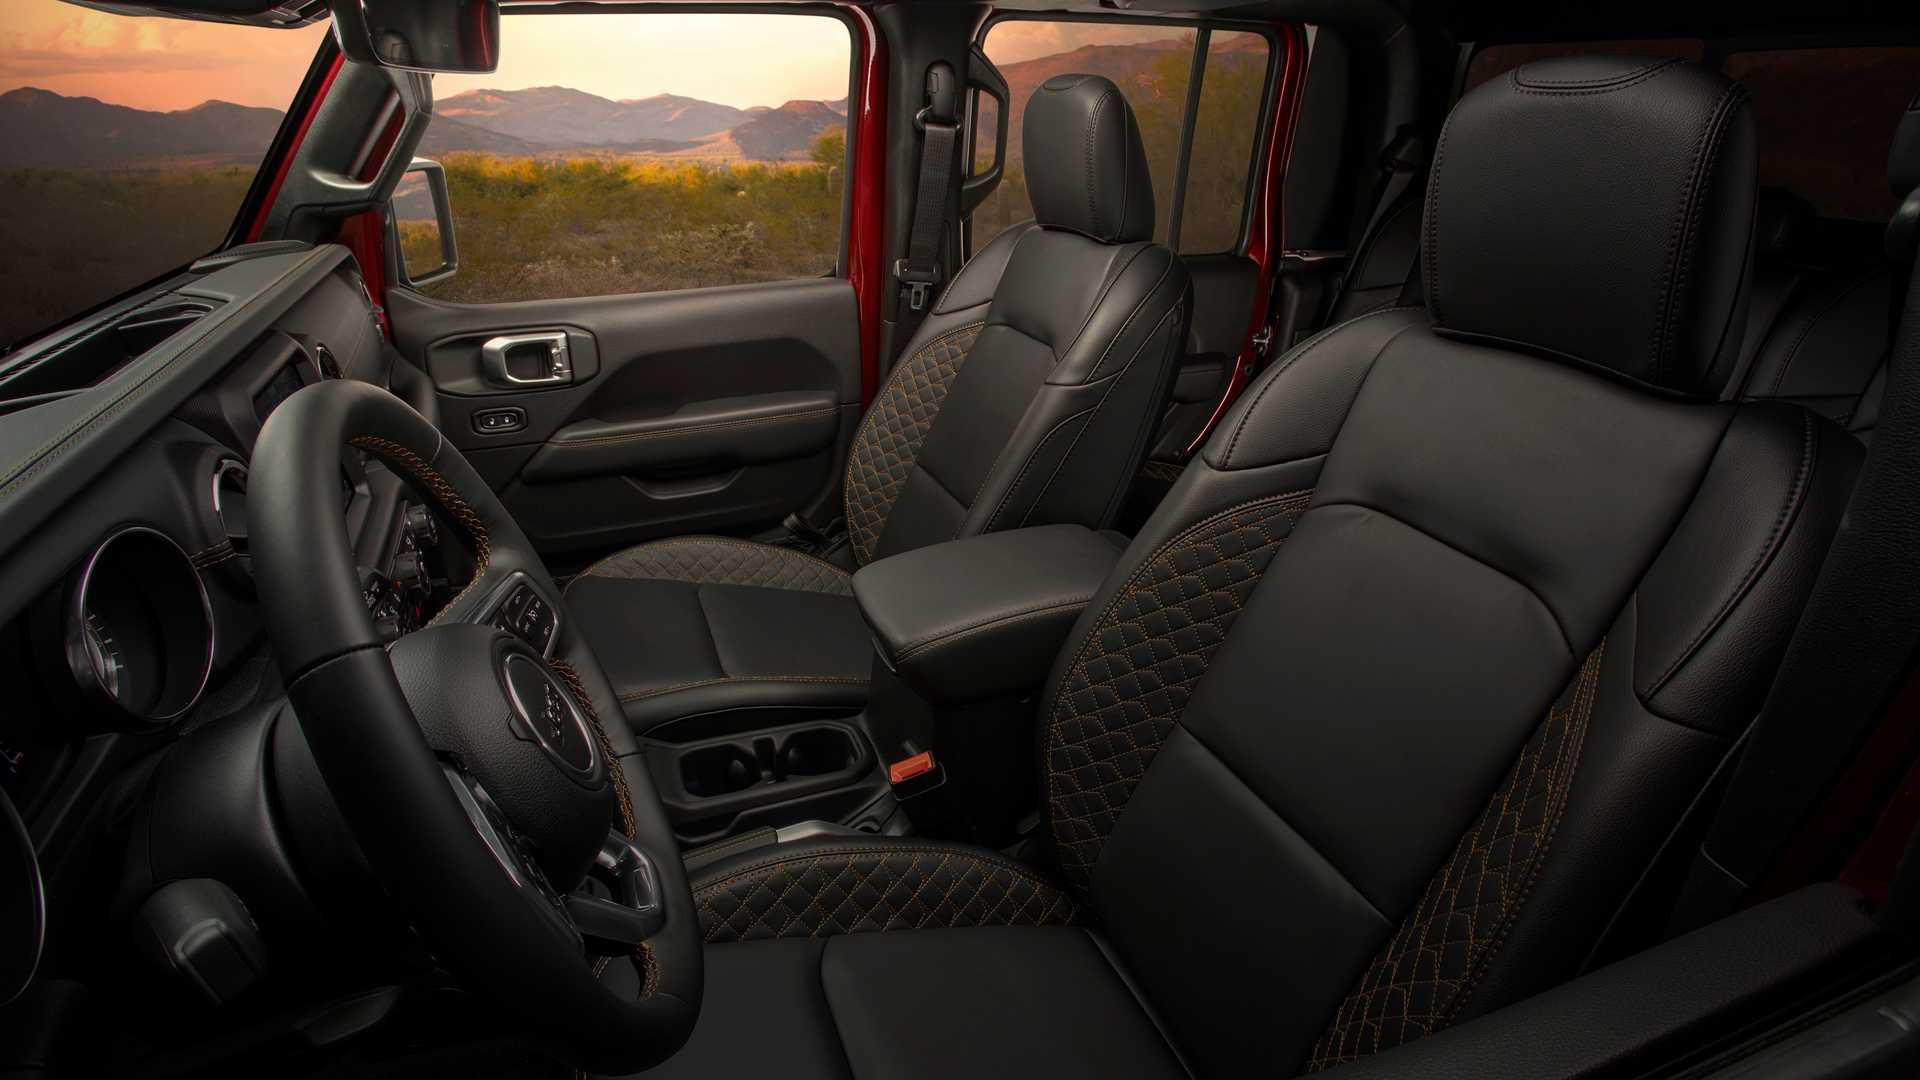 2020-jeep-gladiator-high-altitude-5